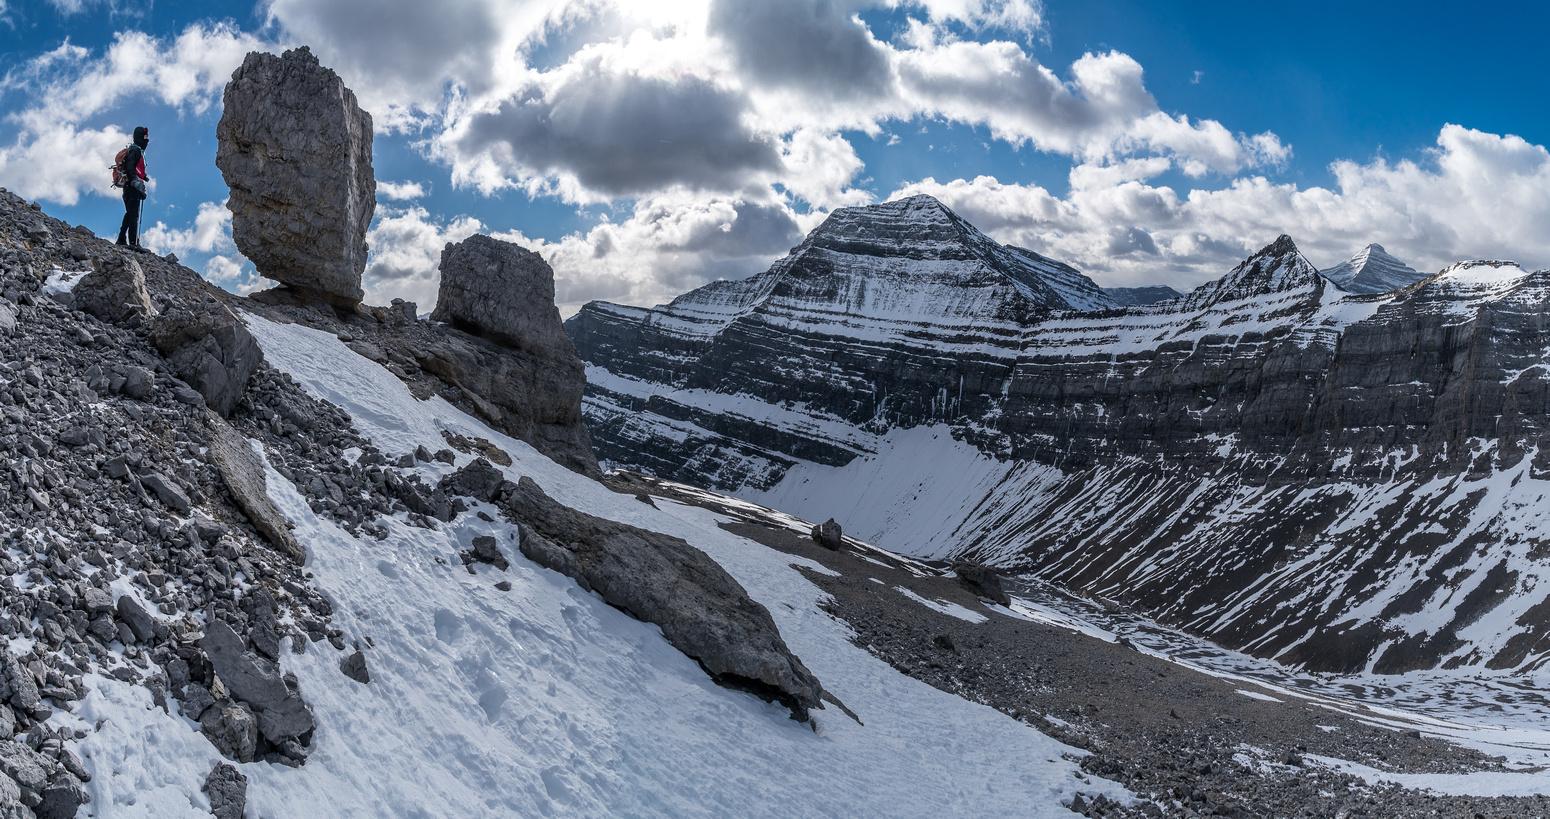 Interesting rock scenery on the ridge.